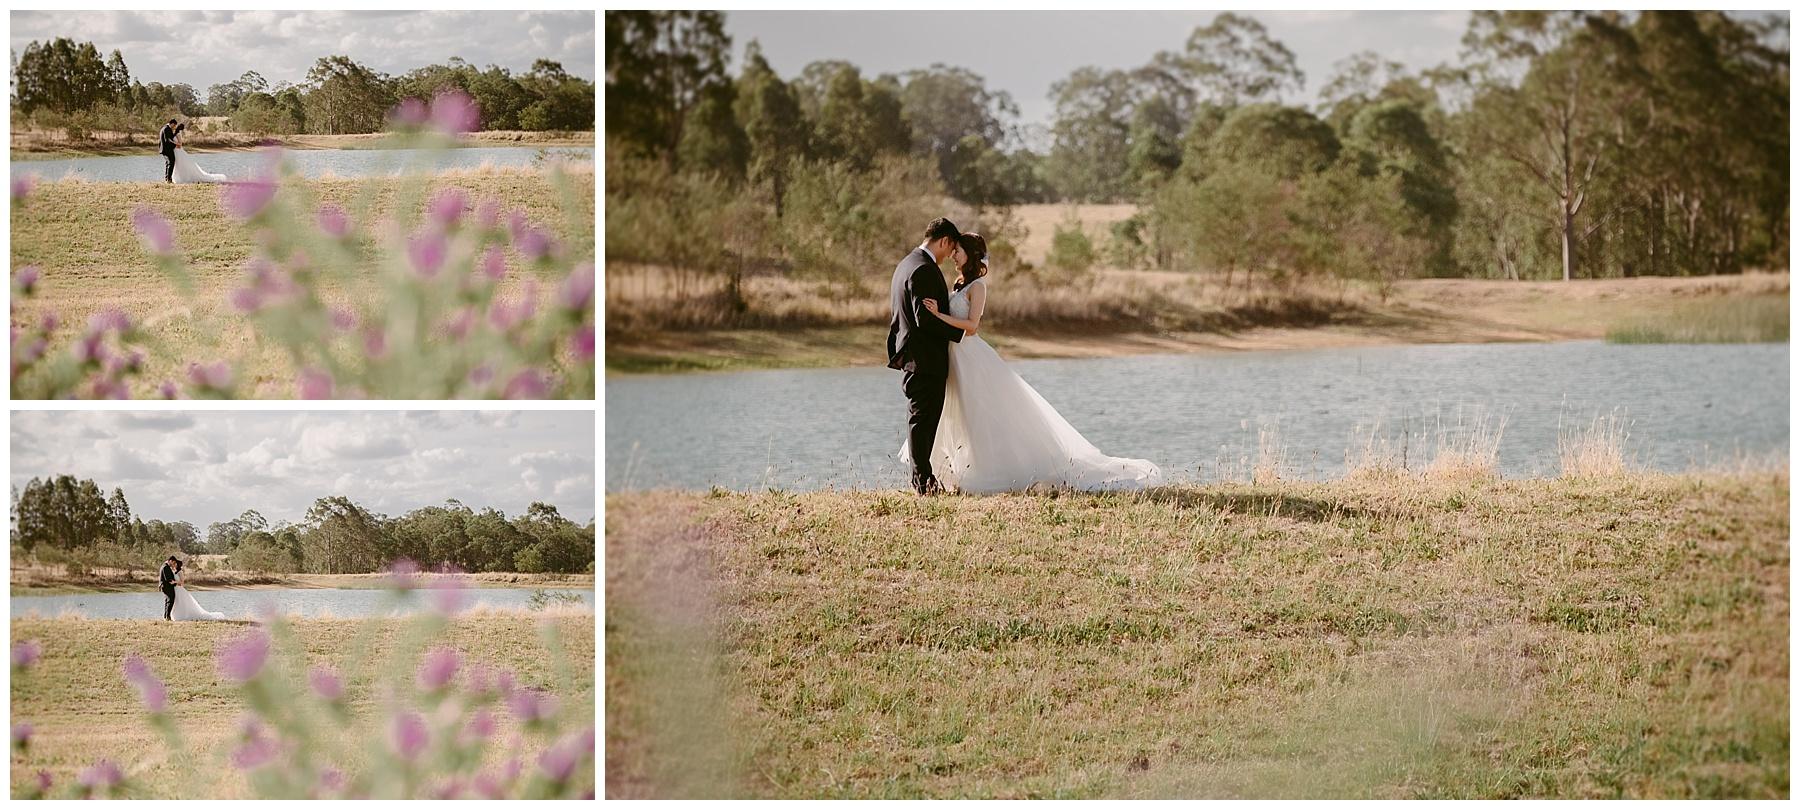 AUDREY WILKING COCKFIGHTERS GHOST Wedding Photographer_0054.jpg